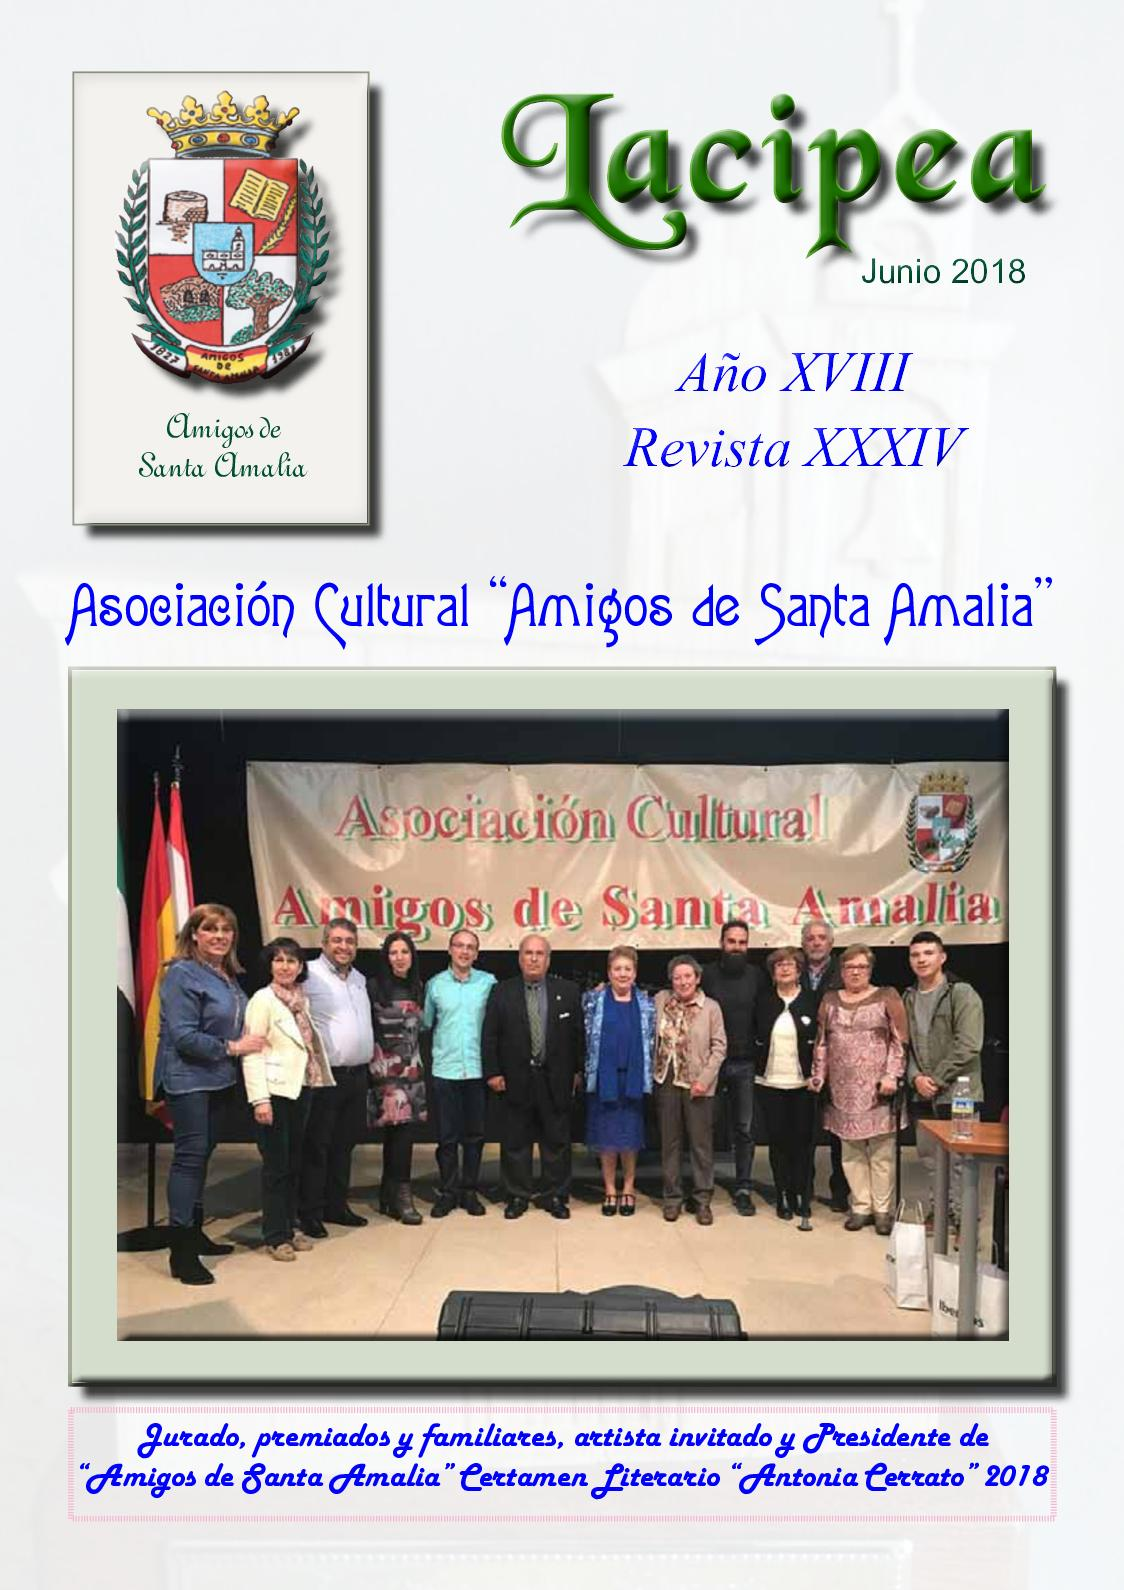 f8079095 Calaméo - Lacipea nº junio/2018. Revista de Santa Amalia